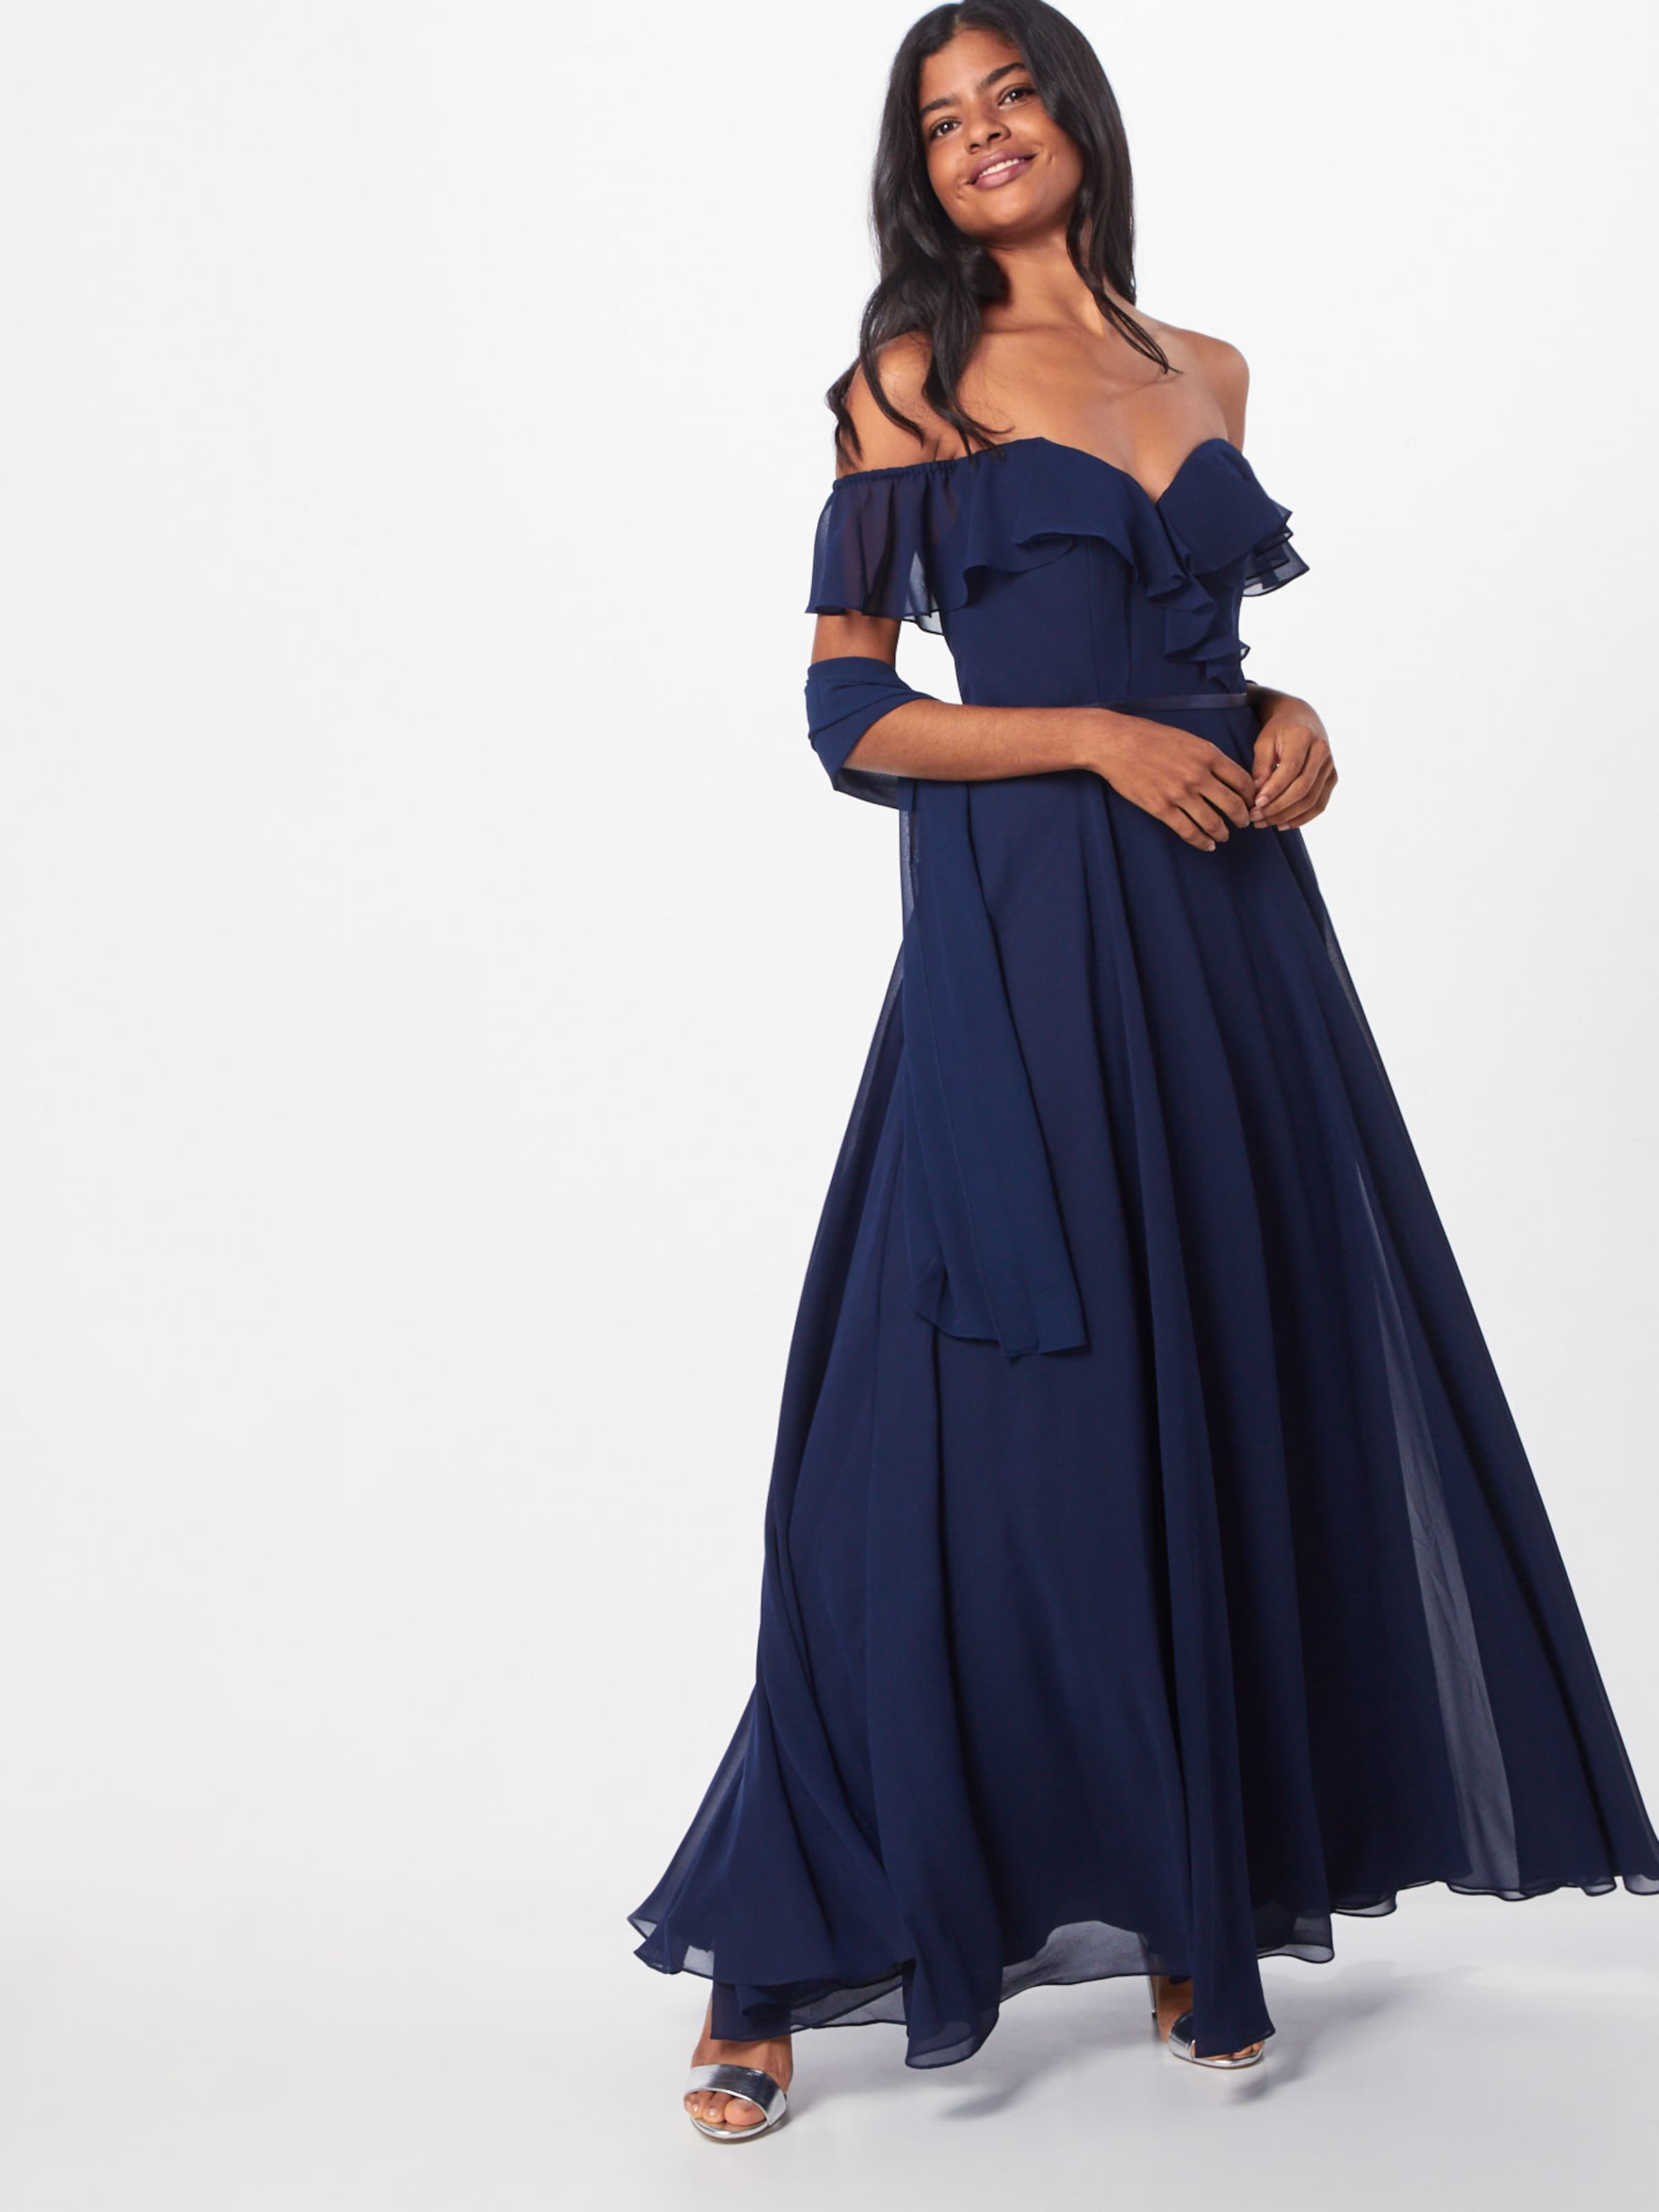 In Mascara 'frilled' Mascara Kleid Navy 'frilled' Kleid In n80mNw